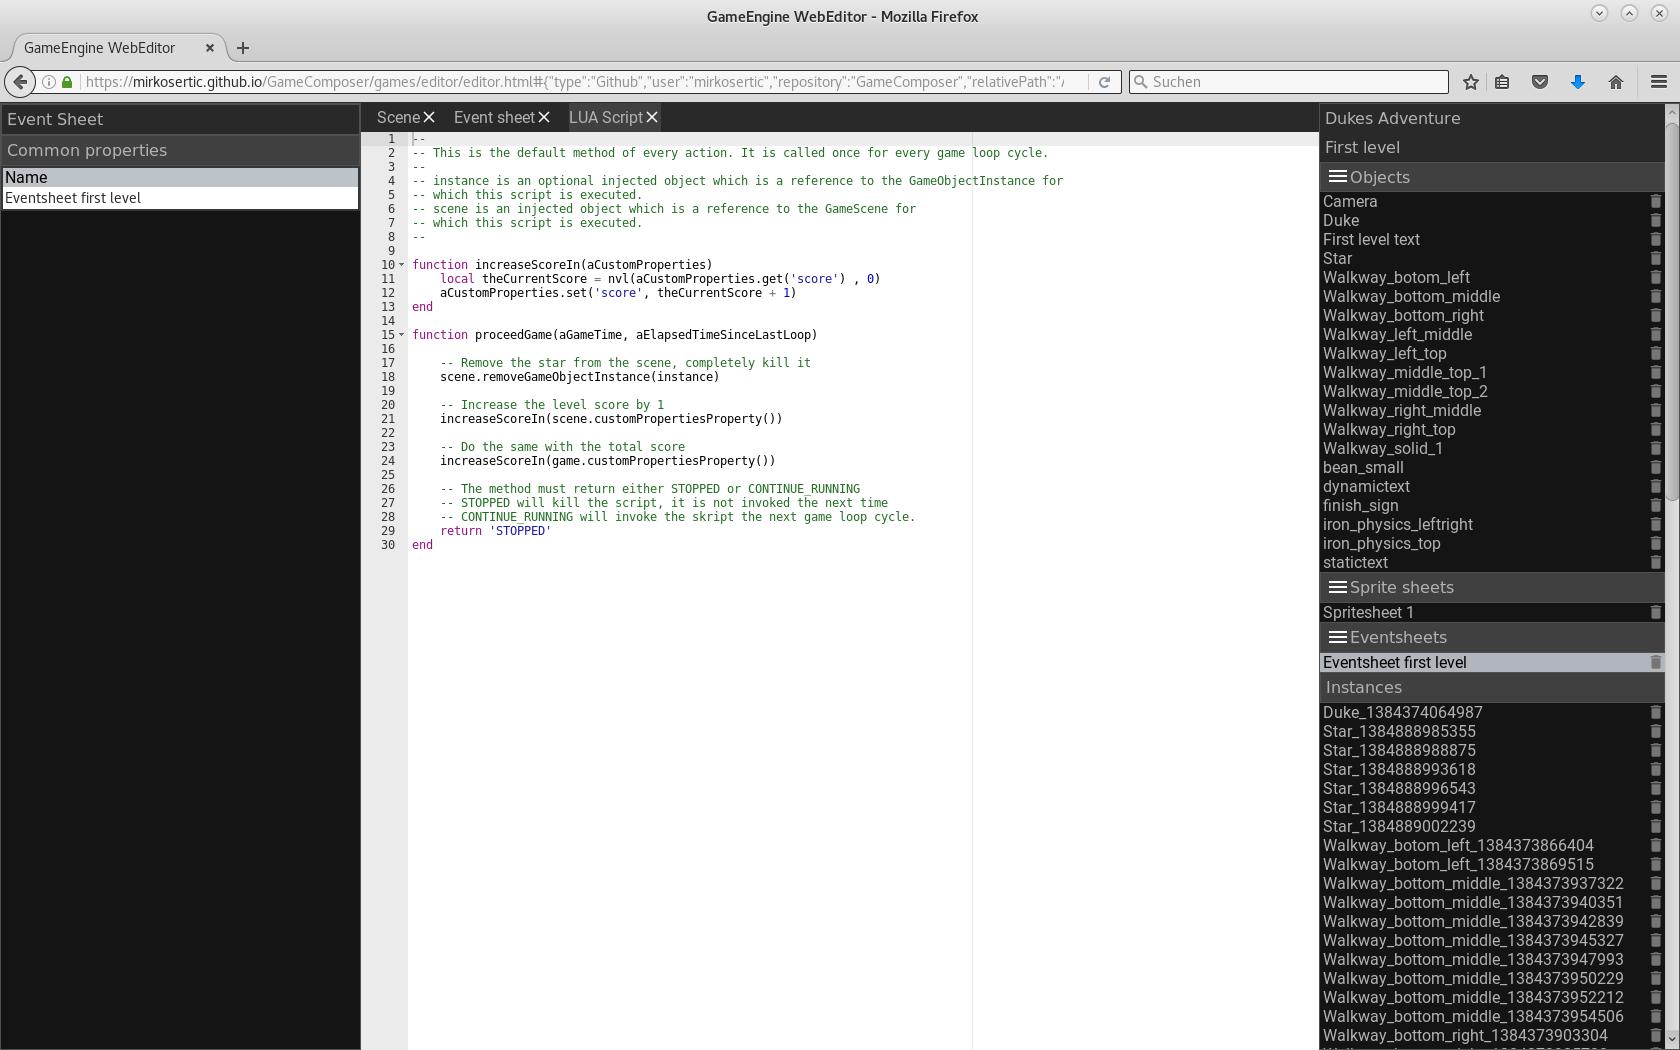 Webeditor editing a LUA script